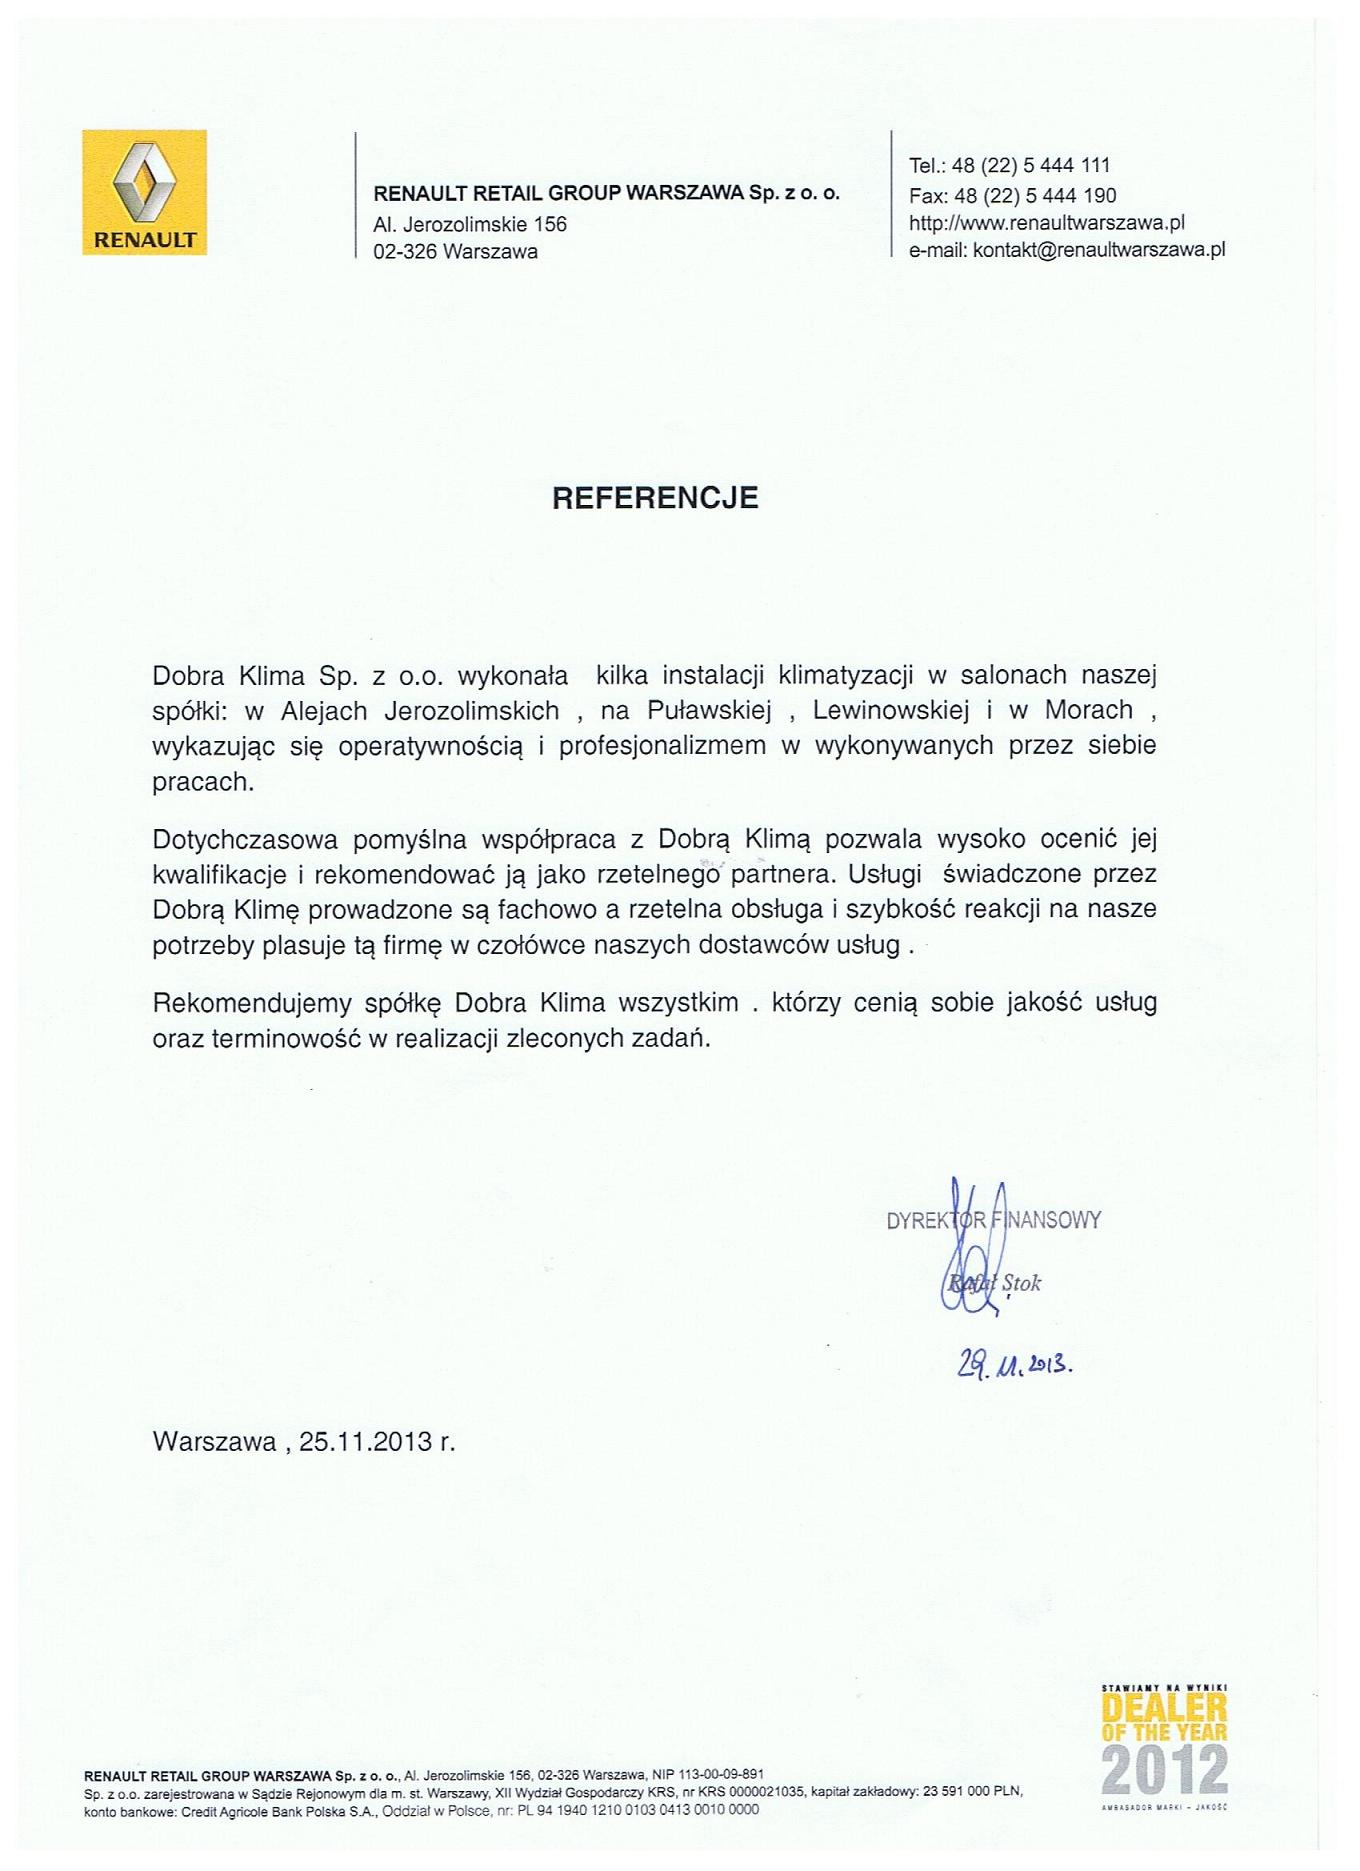 2013-referencje-renault